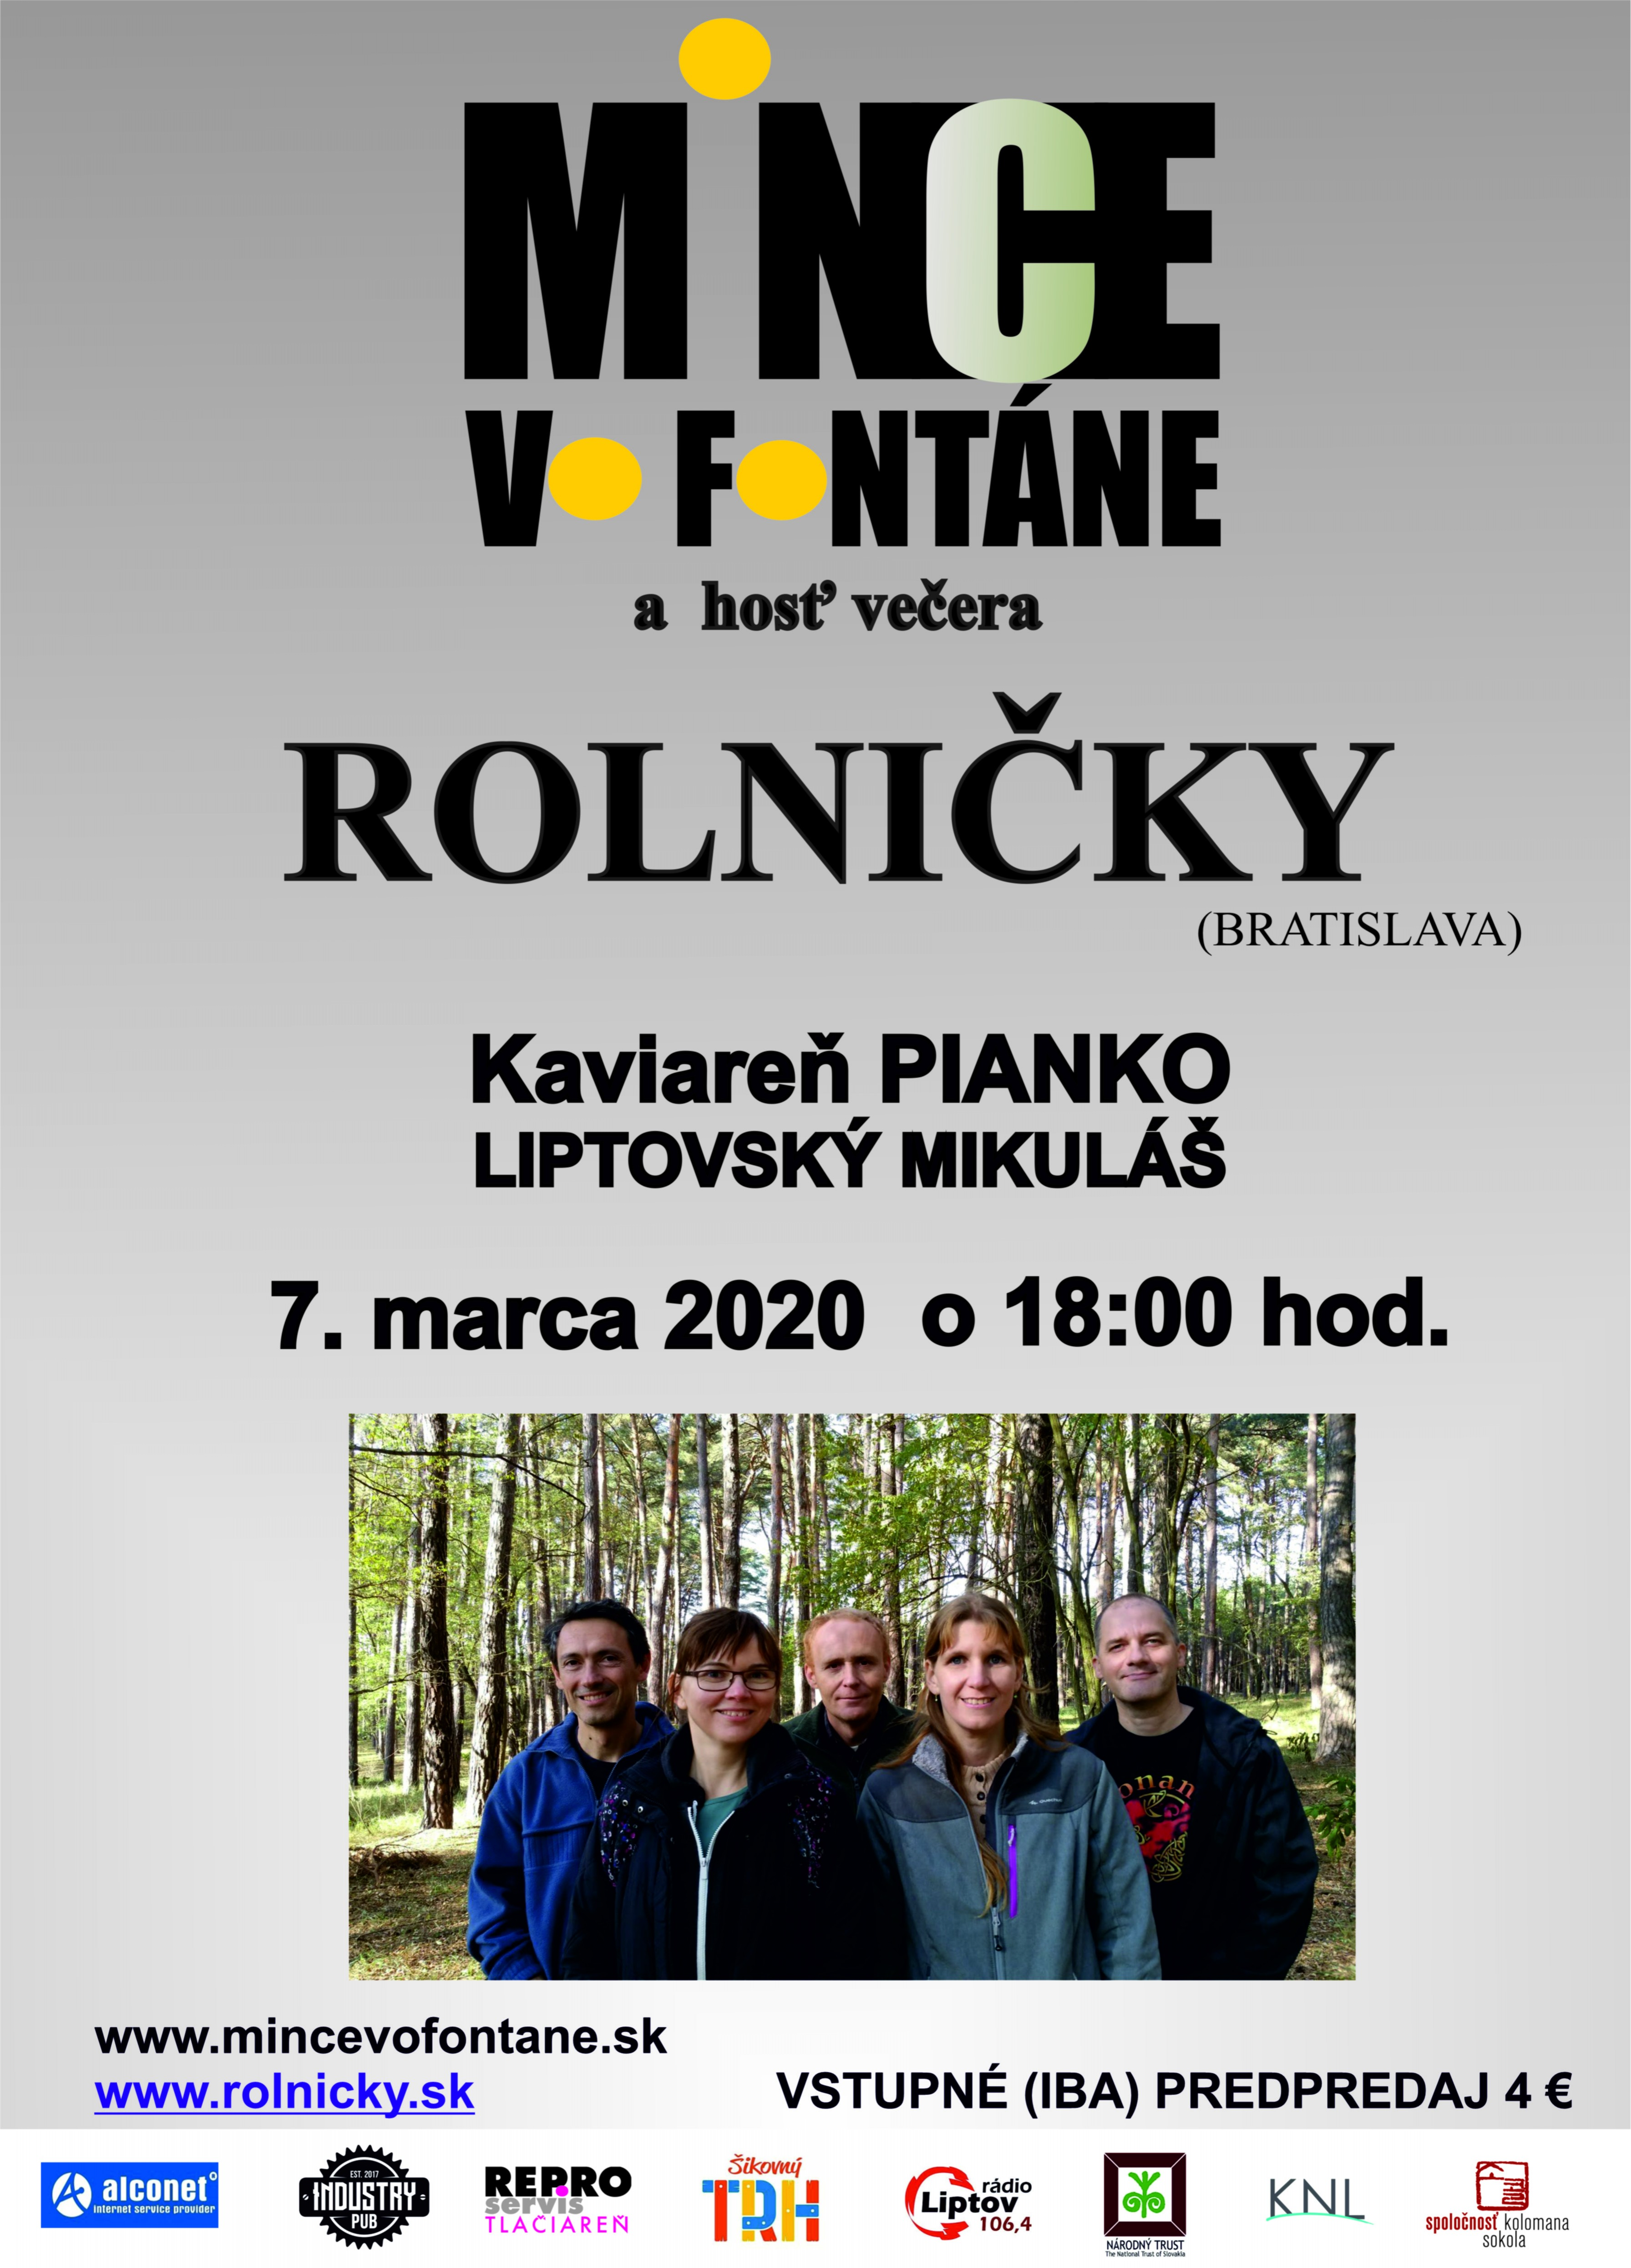 Akustický dvojkoncert s kapelou Rolničky (BA) v Piánku